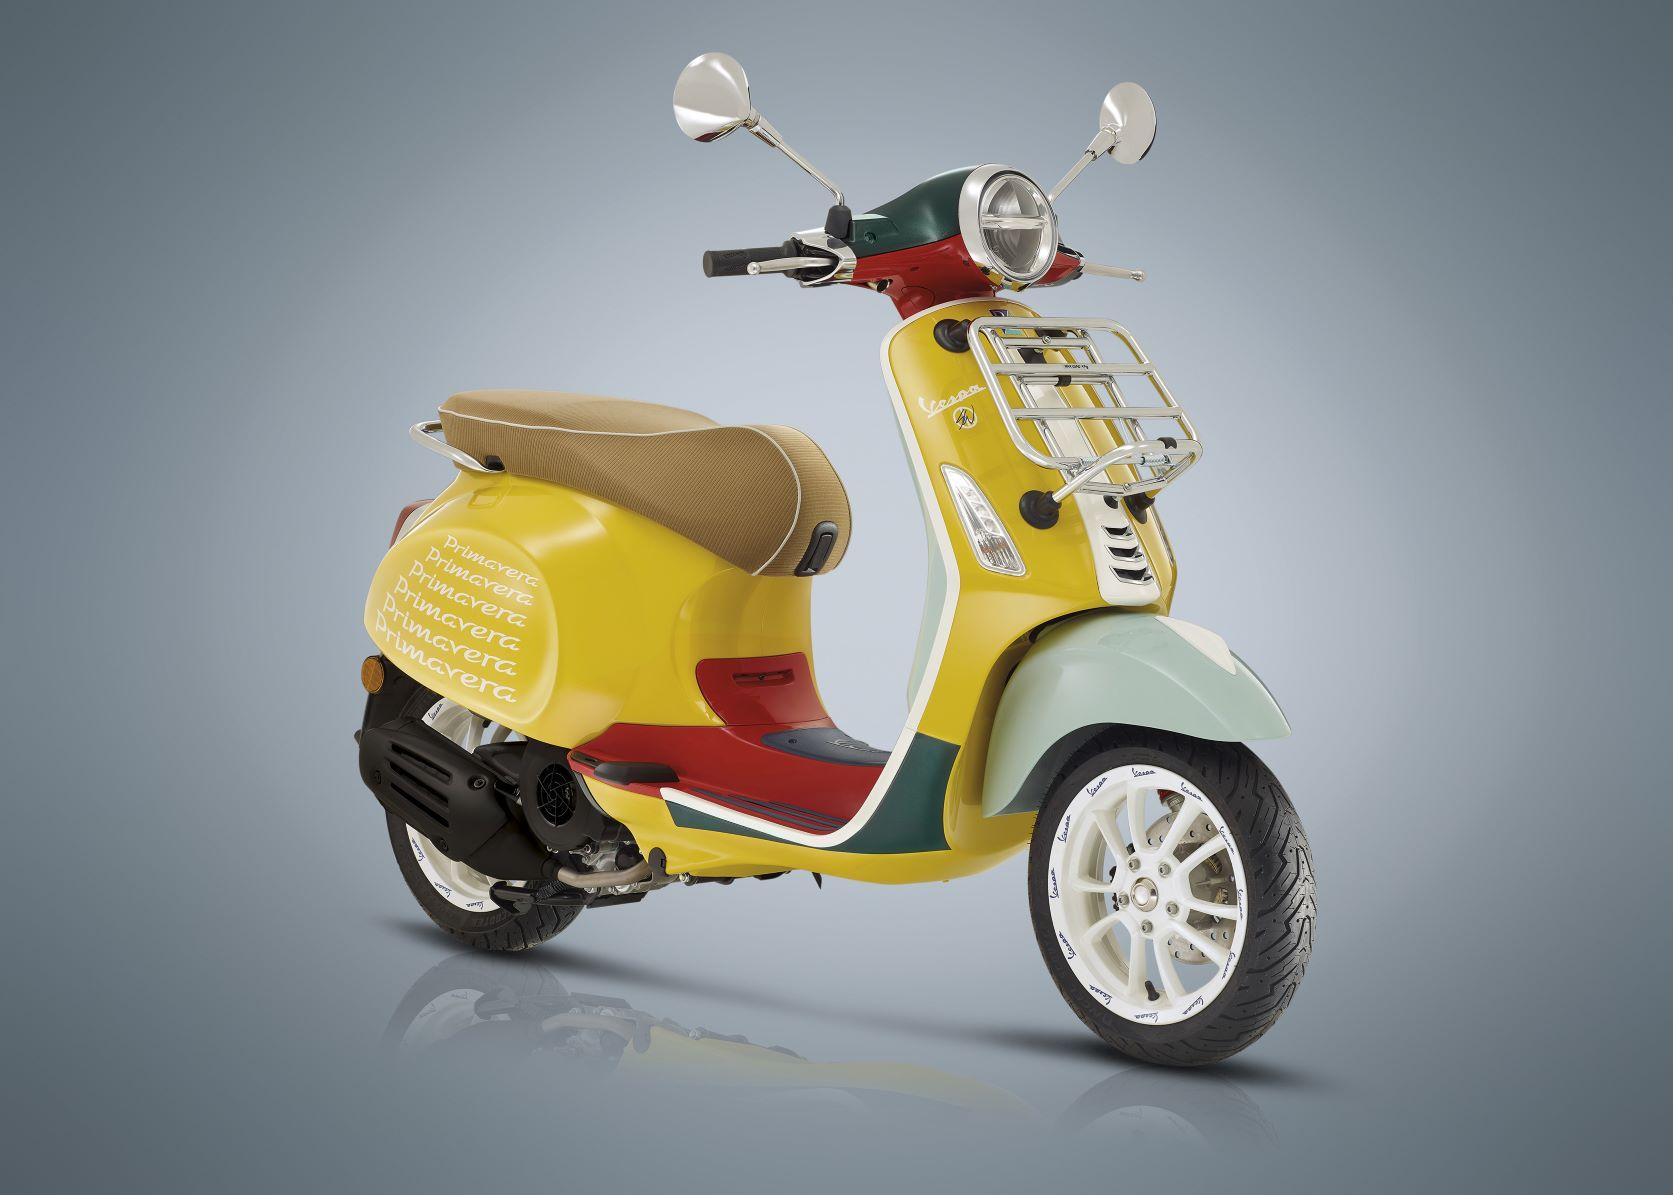 Vespa Vespa Primavera 50 Wotherspoon-Edition Modell 2021 EU5